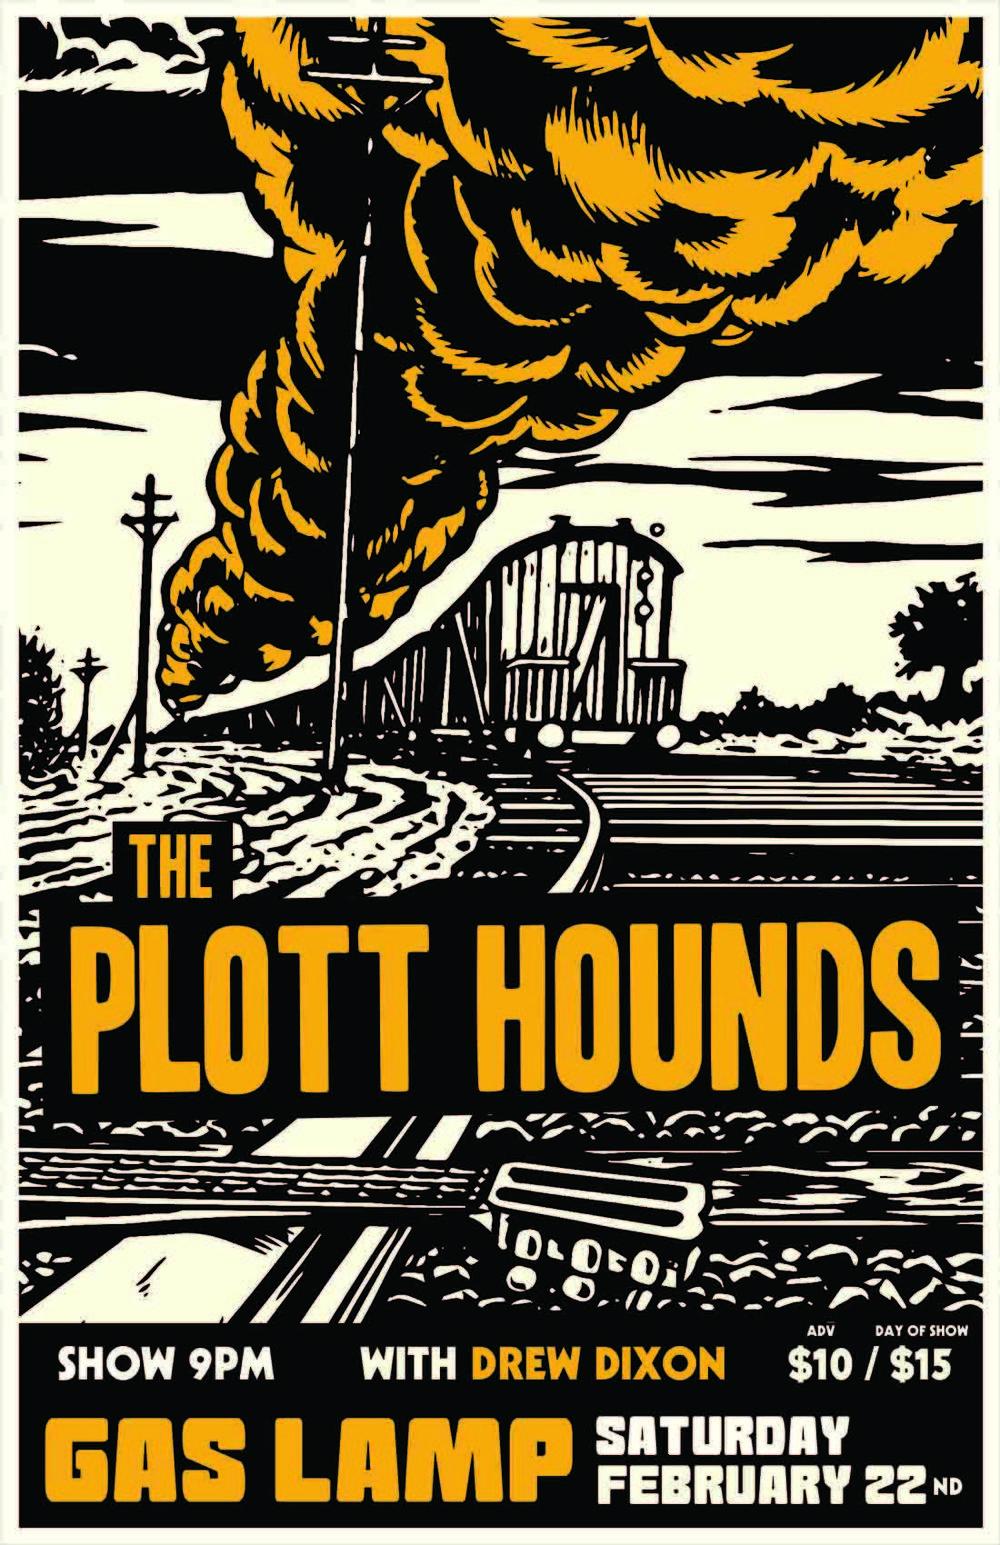 The_plott_hounds_feb_22_copy